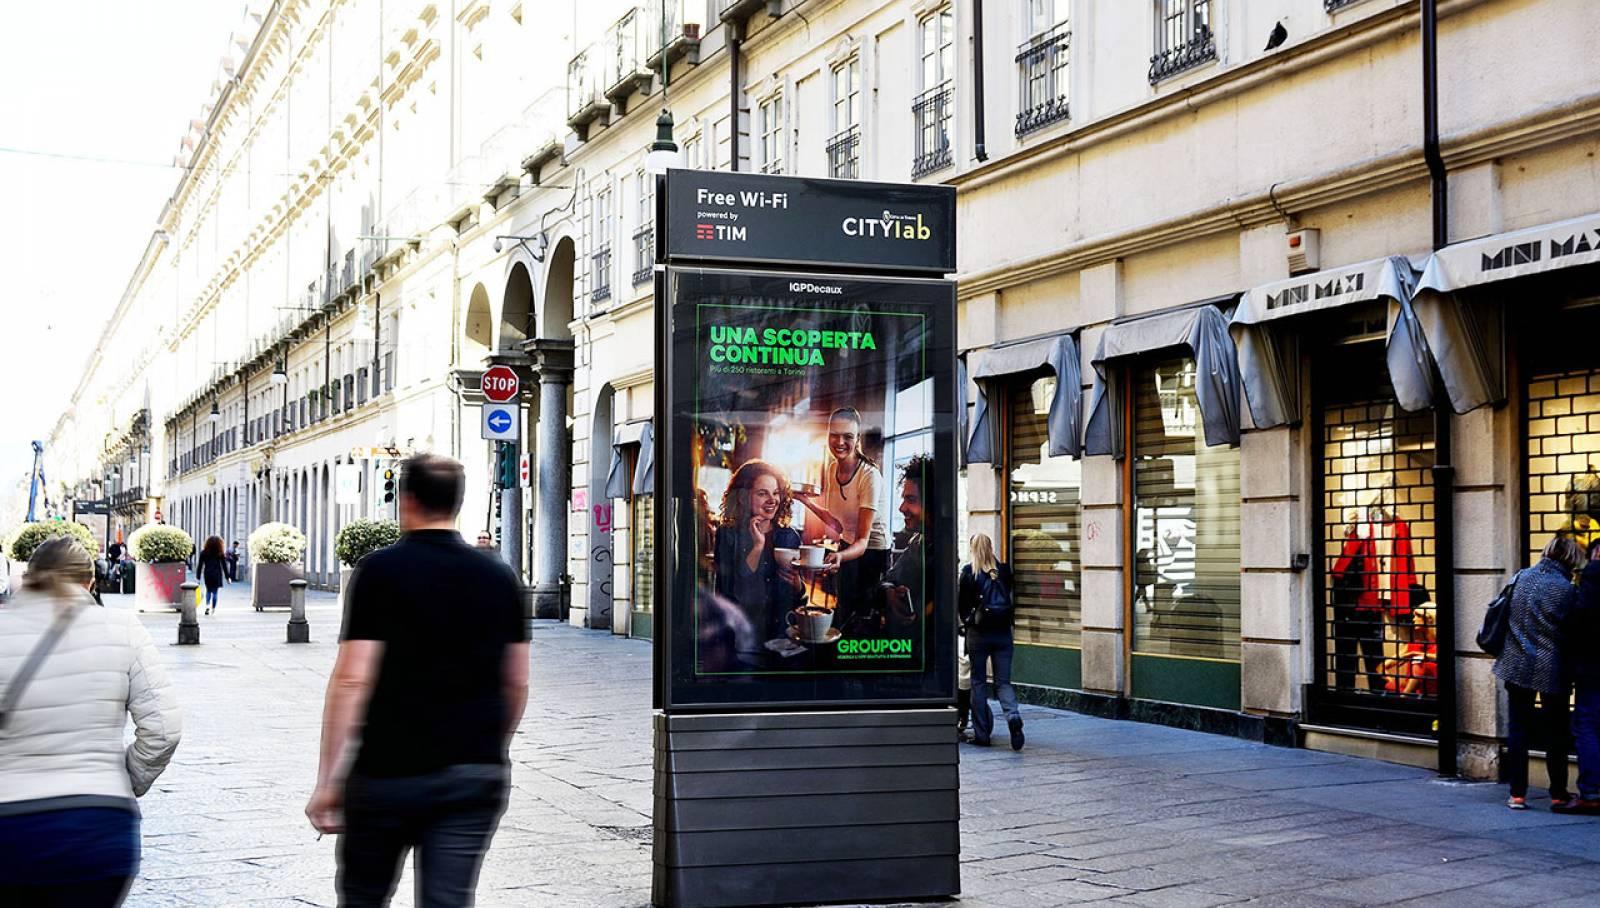 IGPDecaux Torino MUPI per Groupon